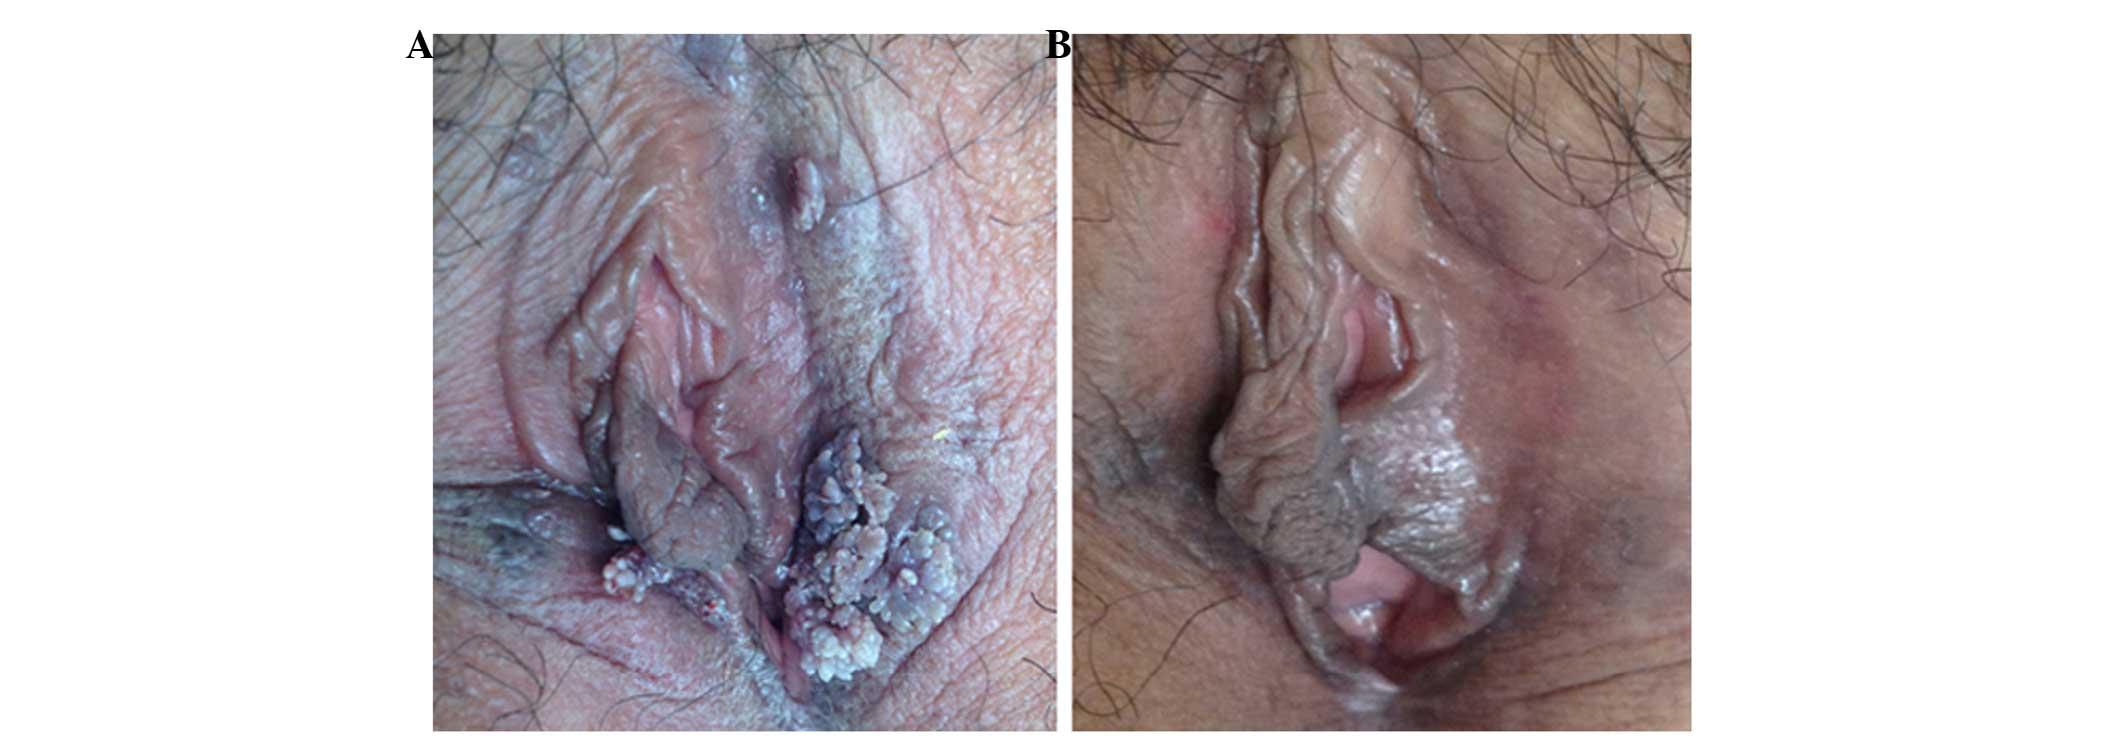 condyloma acuminata laser treatment